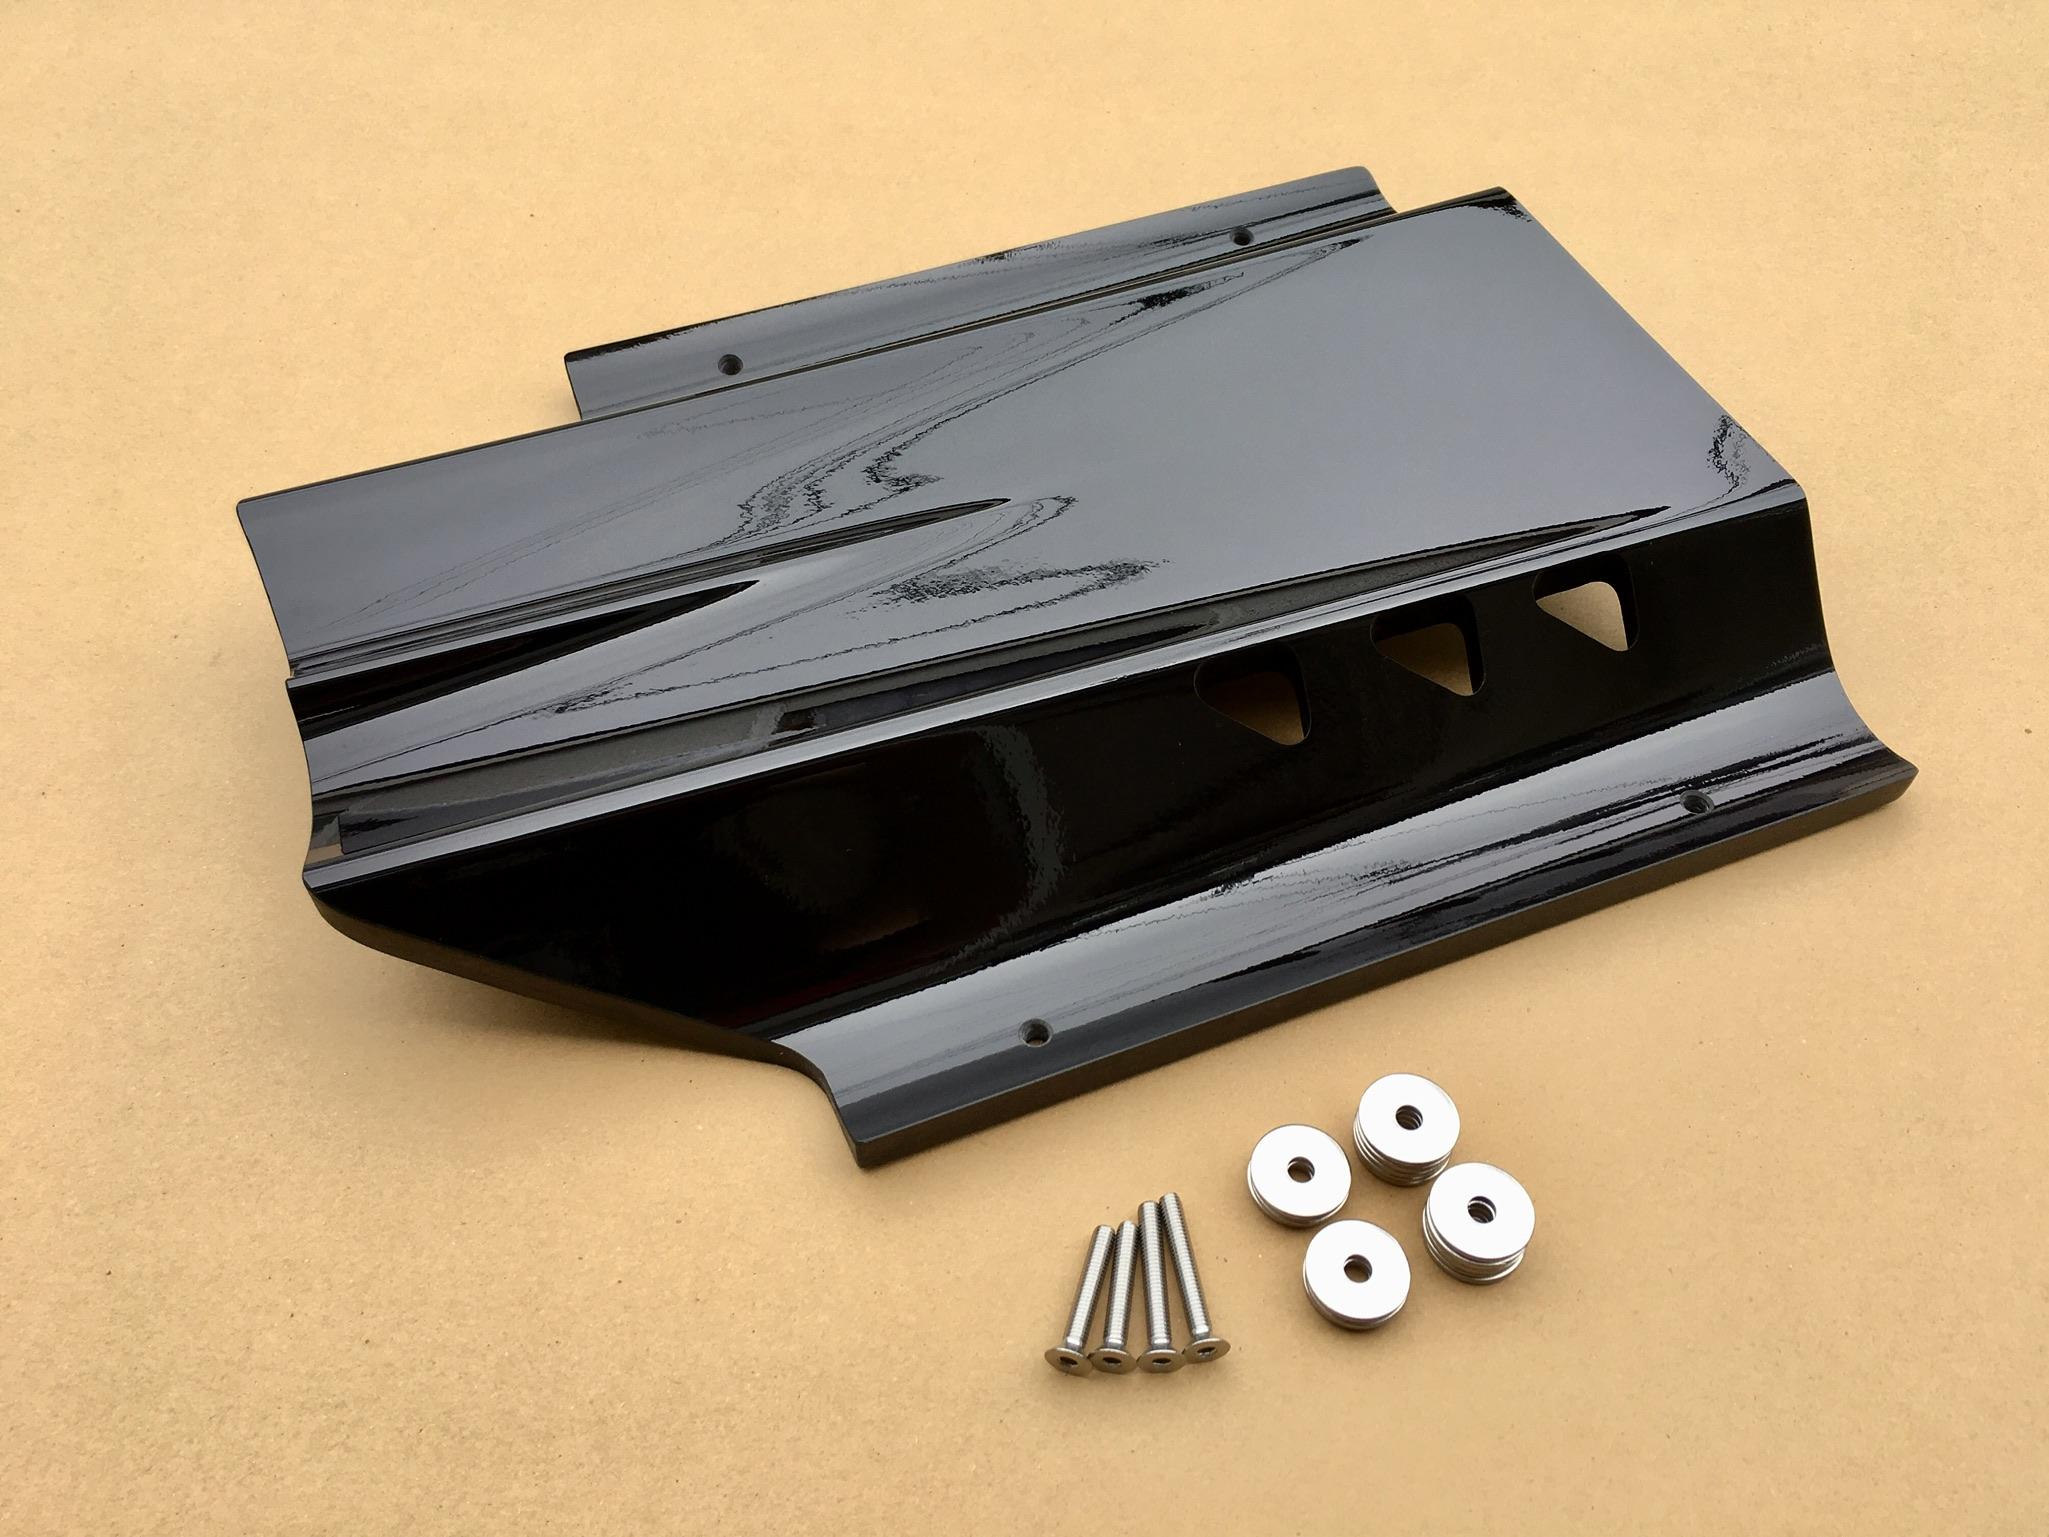 【CM-NXR001BK】CRAFTSMAN'S RACING RIDE PLATE +30mm TUKASA